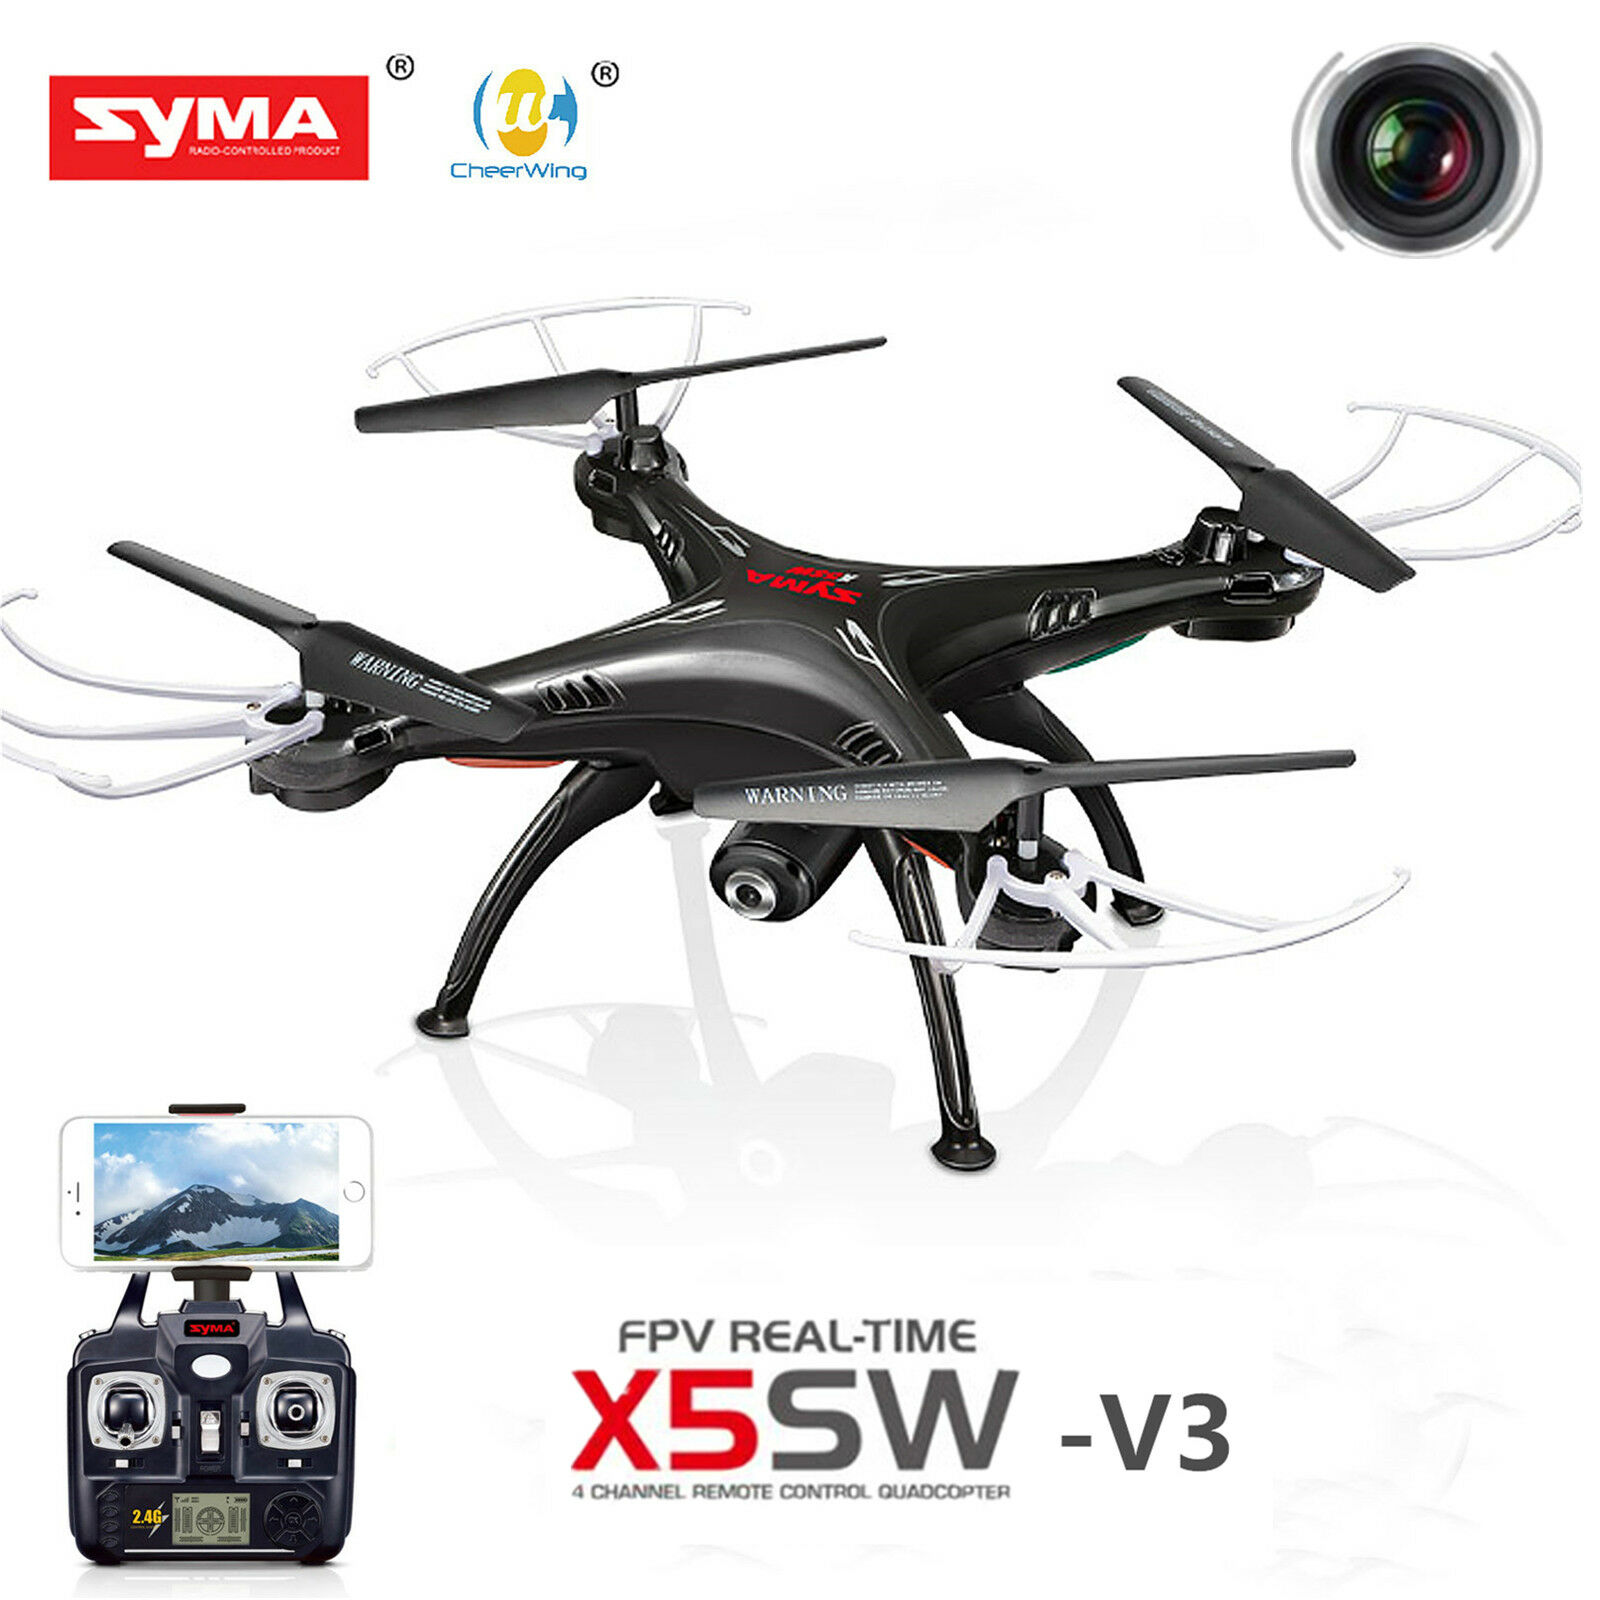 Syma X5SW-V3  Wifi Explorers 2.4G RC Headless Quadcopter Drones with HD teletelecamera  sconti e altro